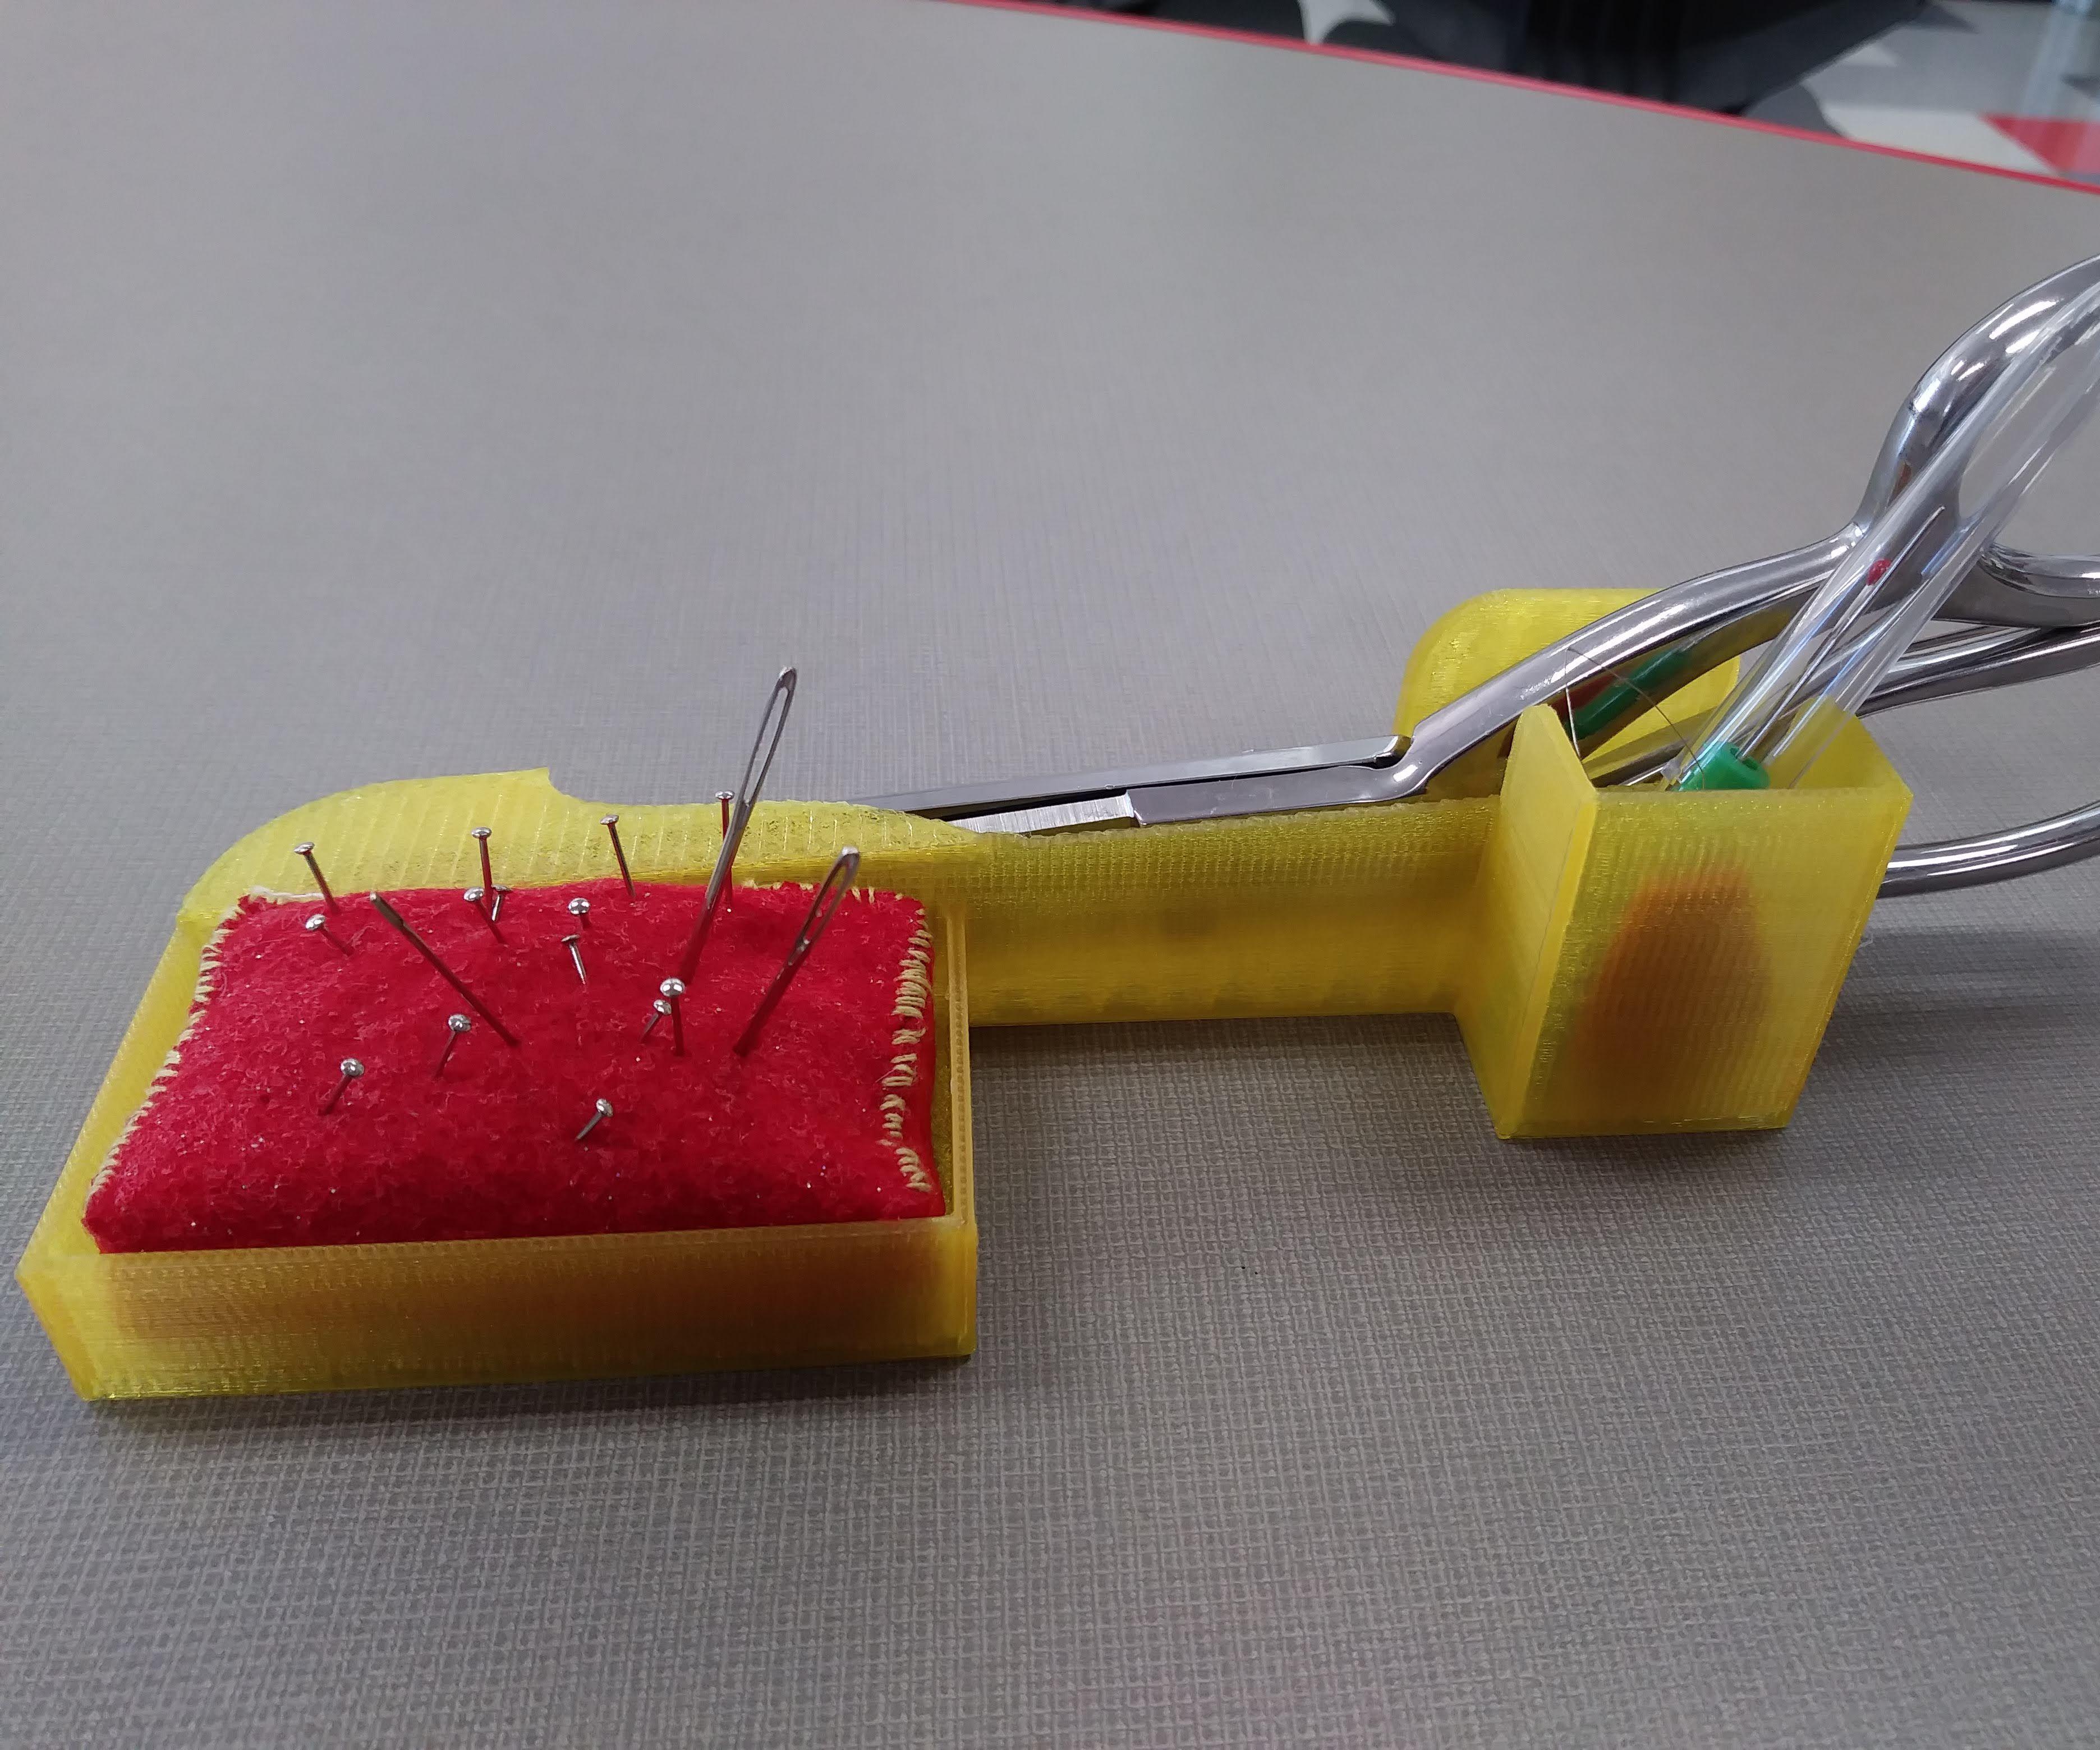 3D Printed Sewing Kit